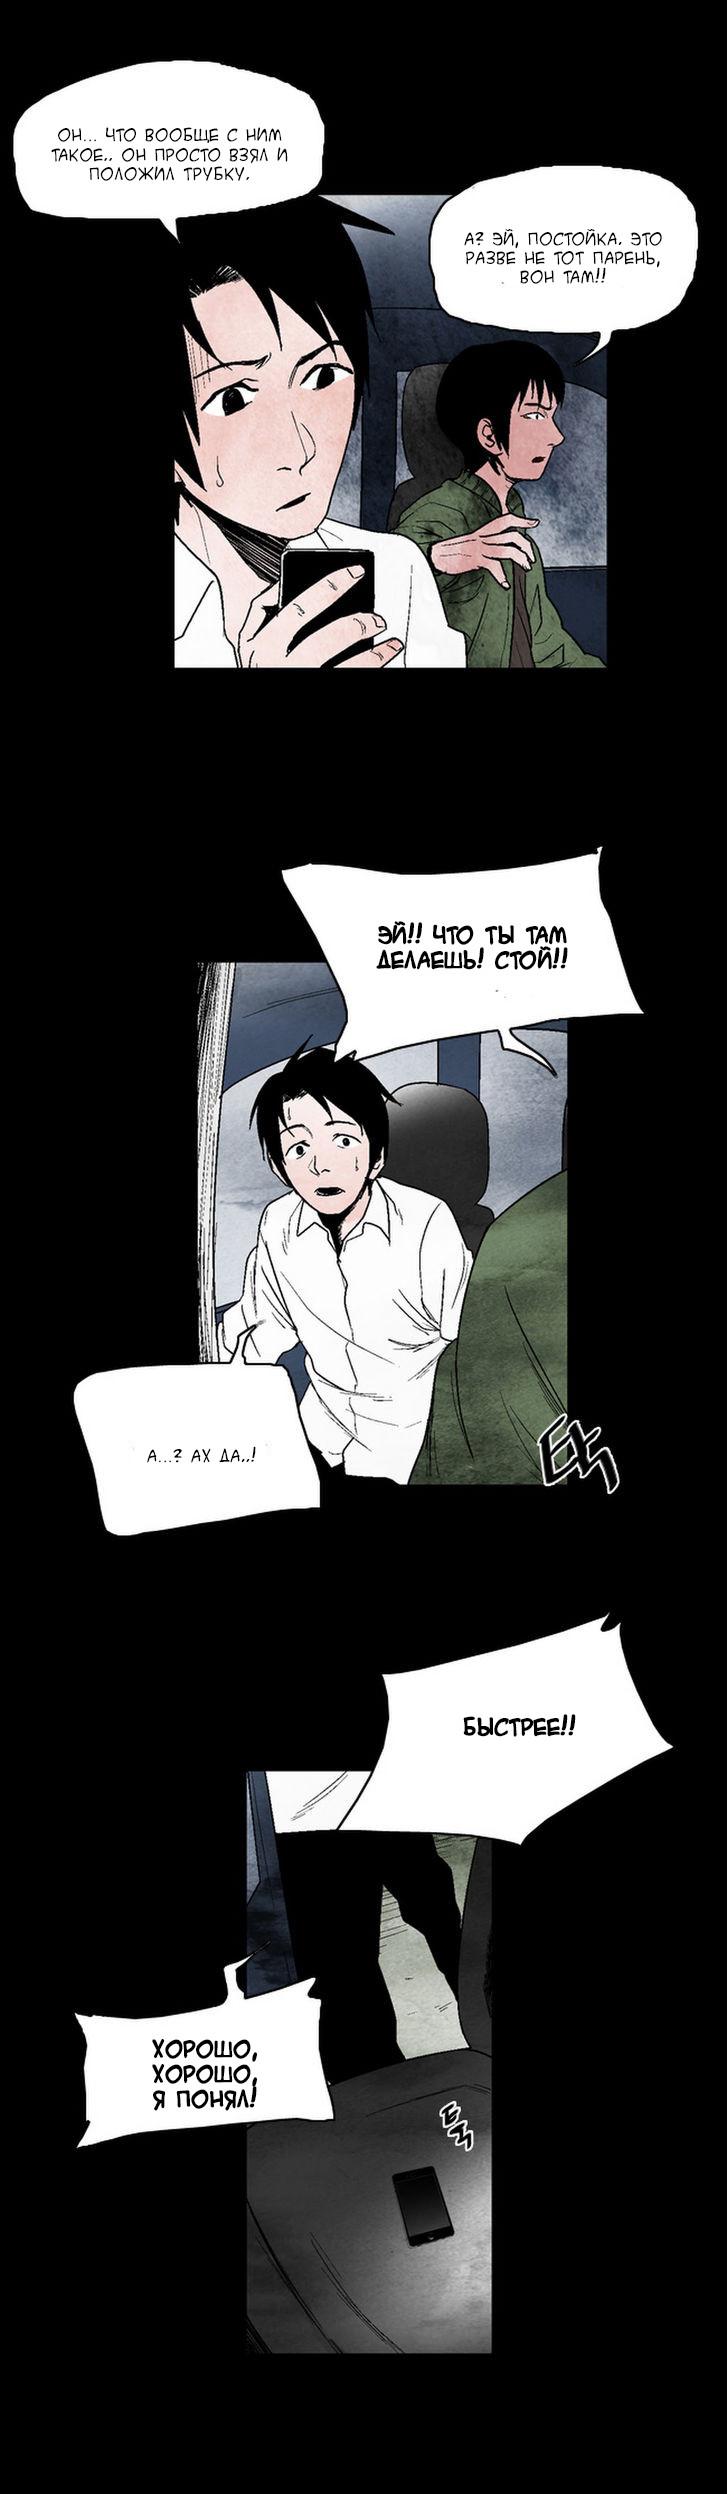 https://r1.ninemanga.com/comics/pic2/14/28302/409574/1519283747934.jpg Page 6